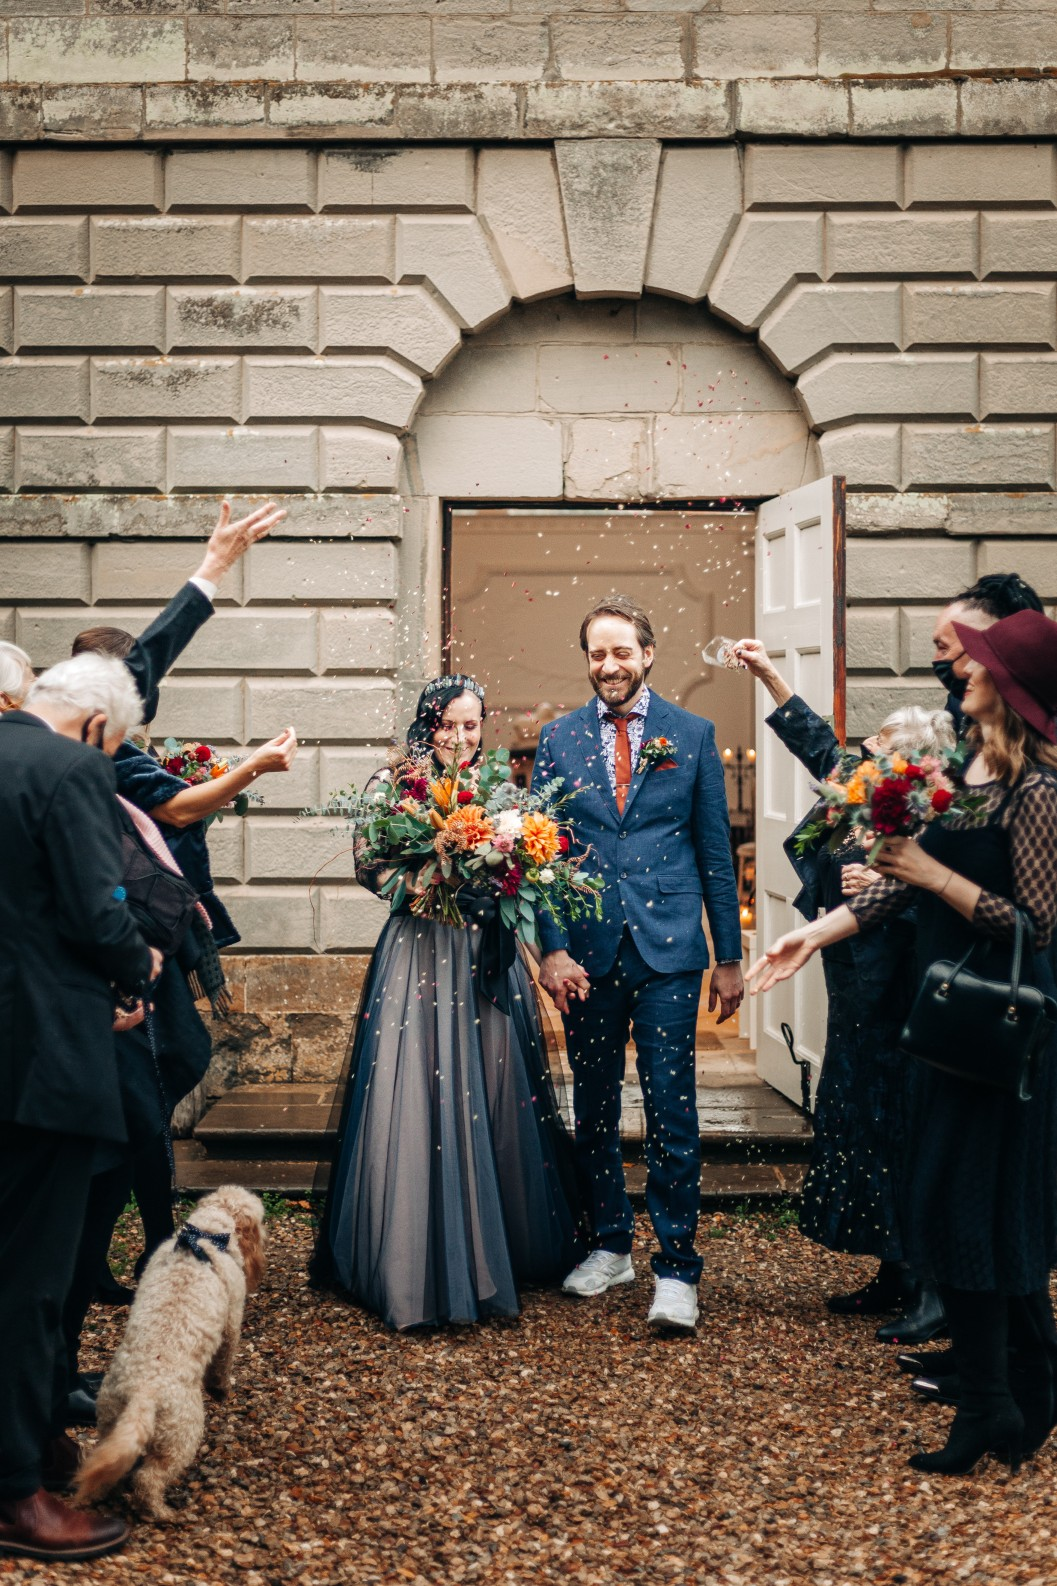 intimate alternative wedding - alternative micro wedding - covid wedding - small wedding ceremony